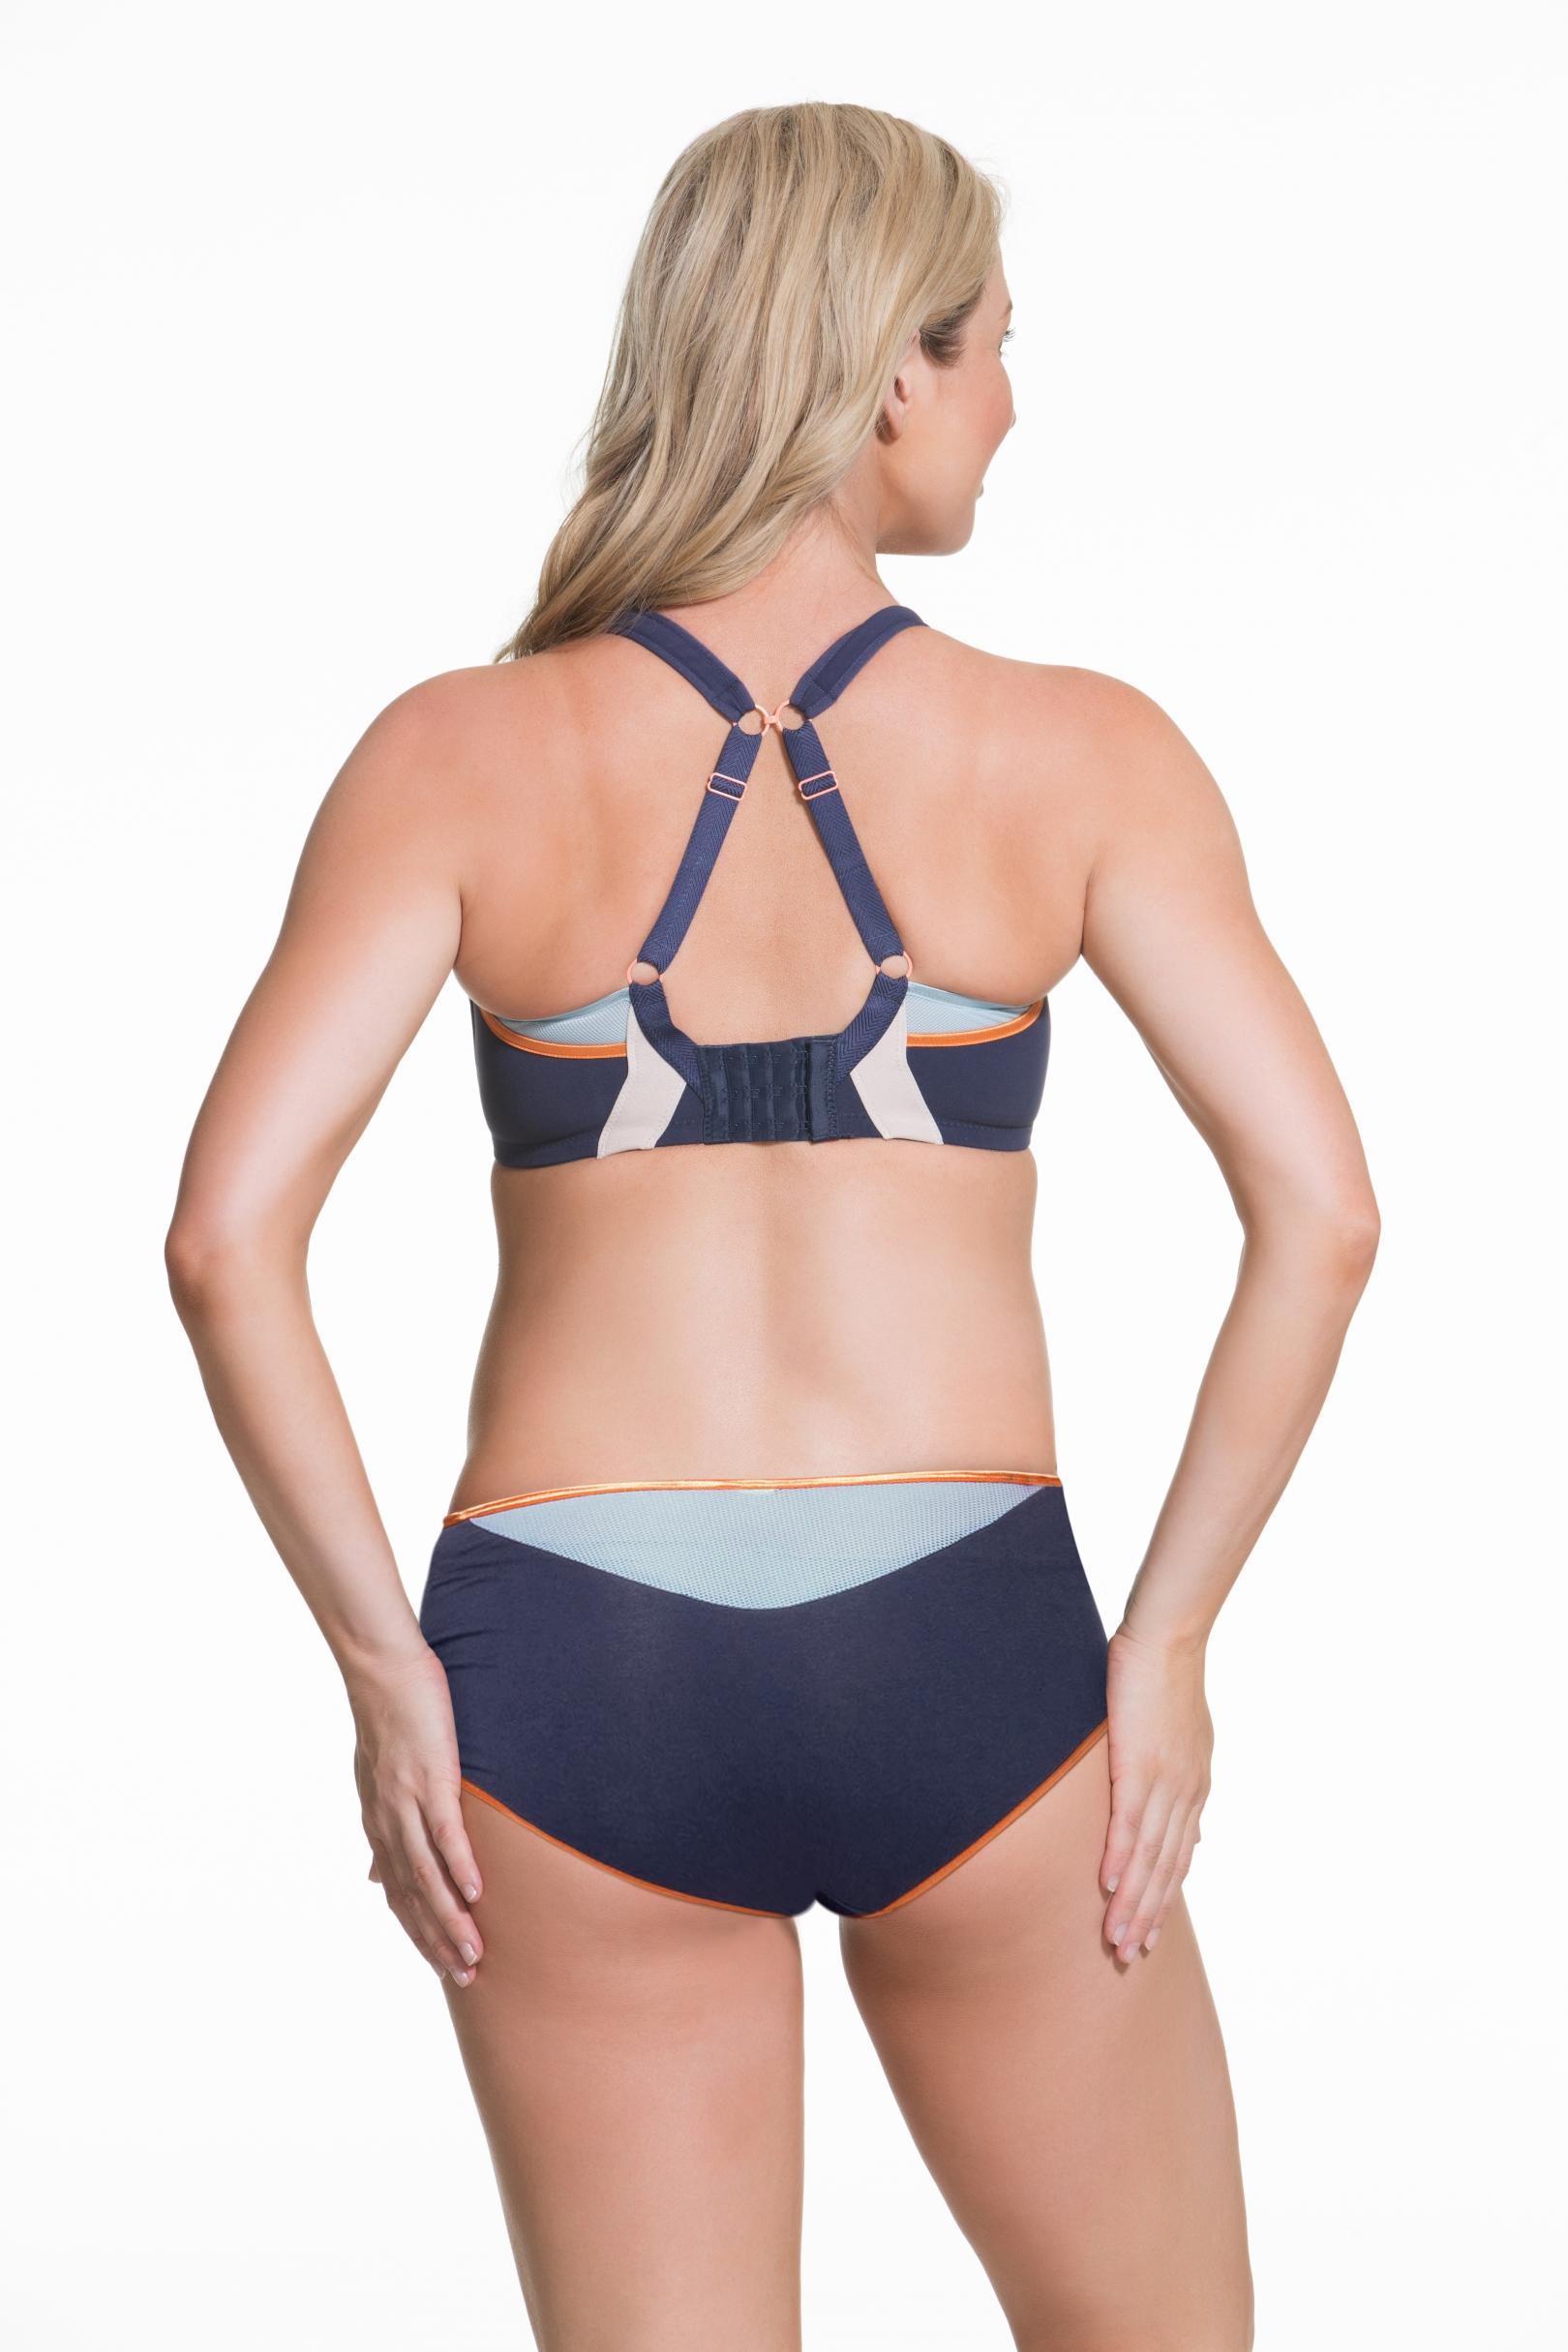 Zest Flexi Wire High Impact Maternity & Nursing Sports Bra